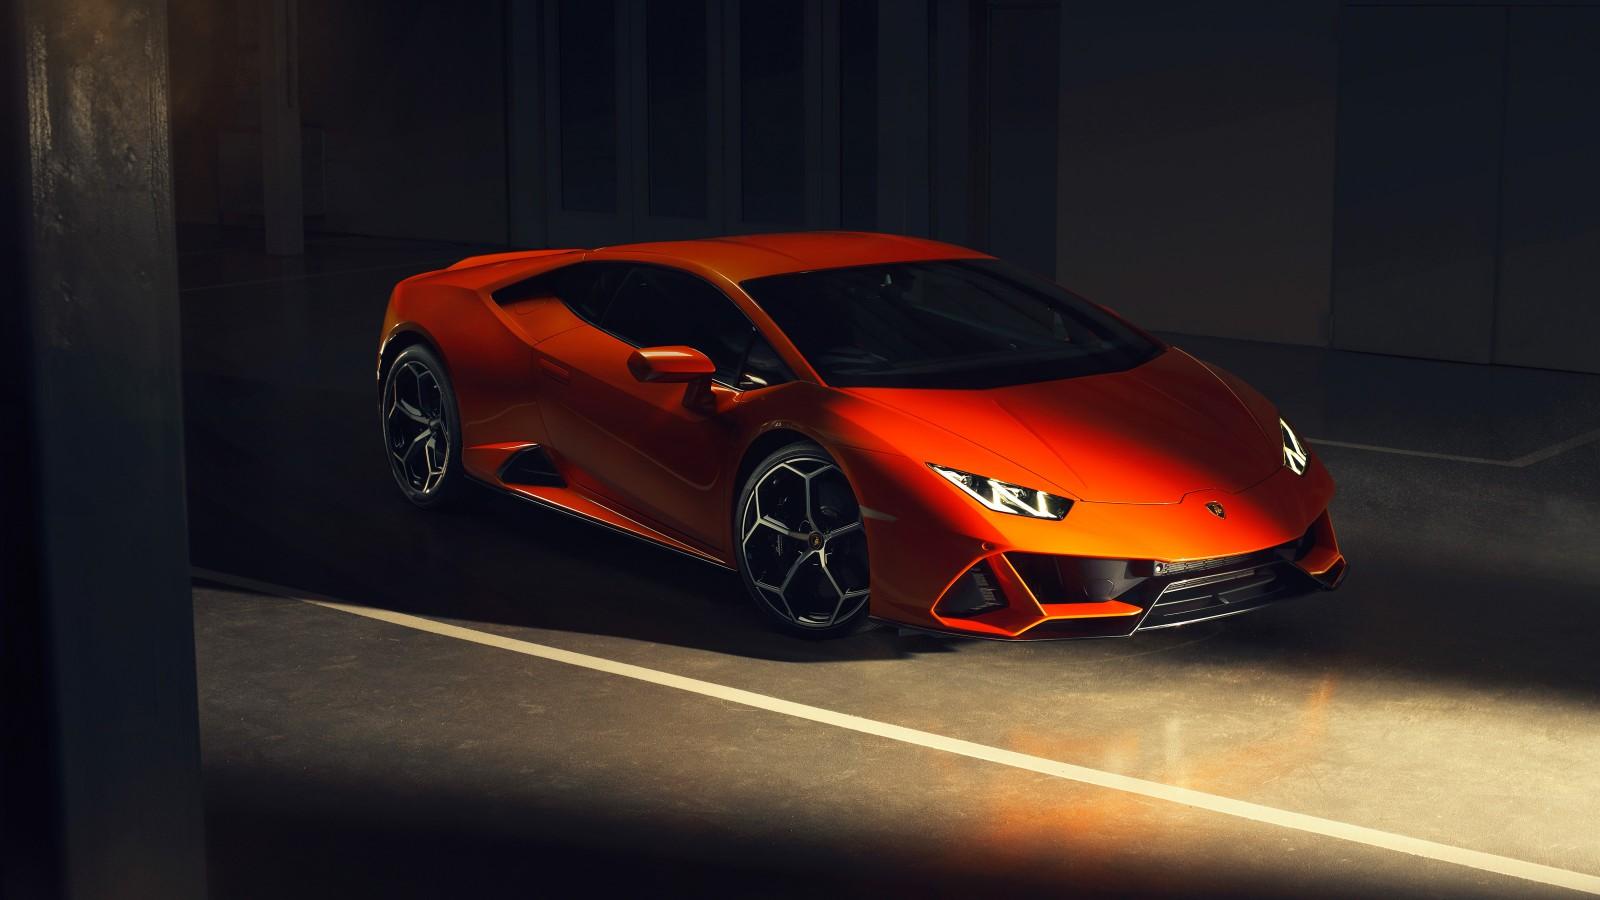 Cute Wallpaper 1440 1080 Lamborghini Huracan Evo 2019 Wallpapers Hd Wallpapers